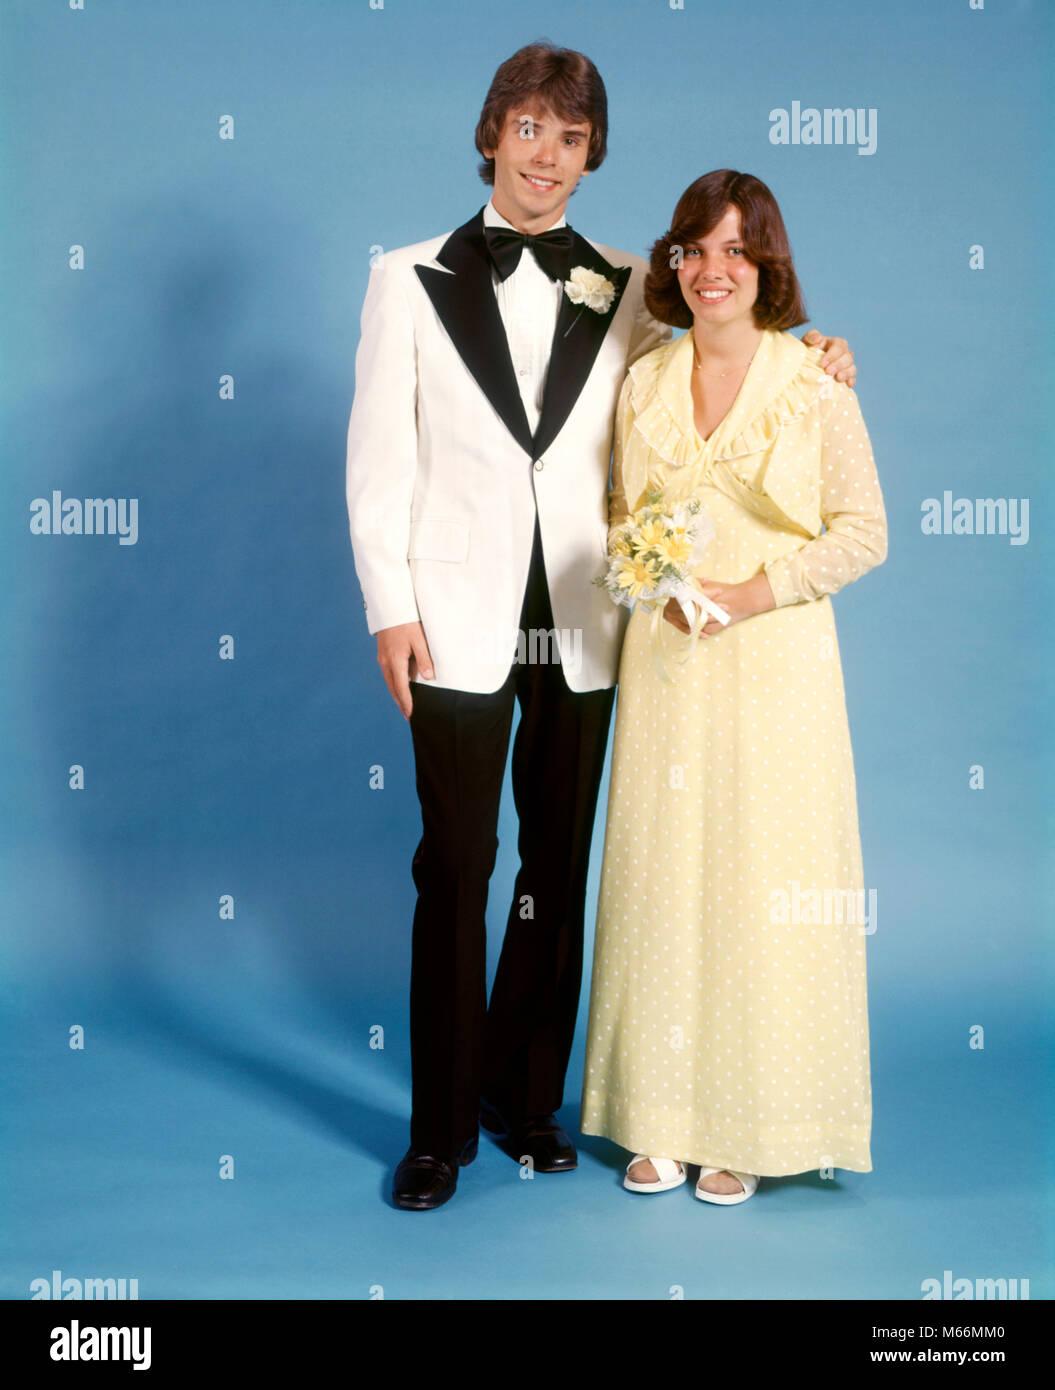 1970 Teen Couple Habillé Pour Le Prom Girl Robe Robe Longue